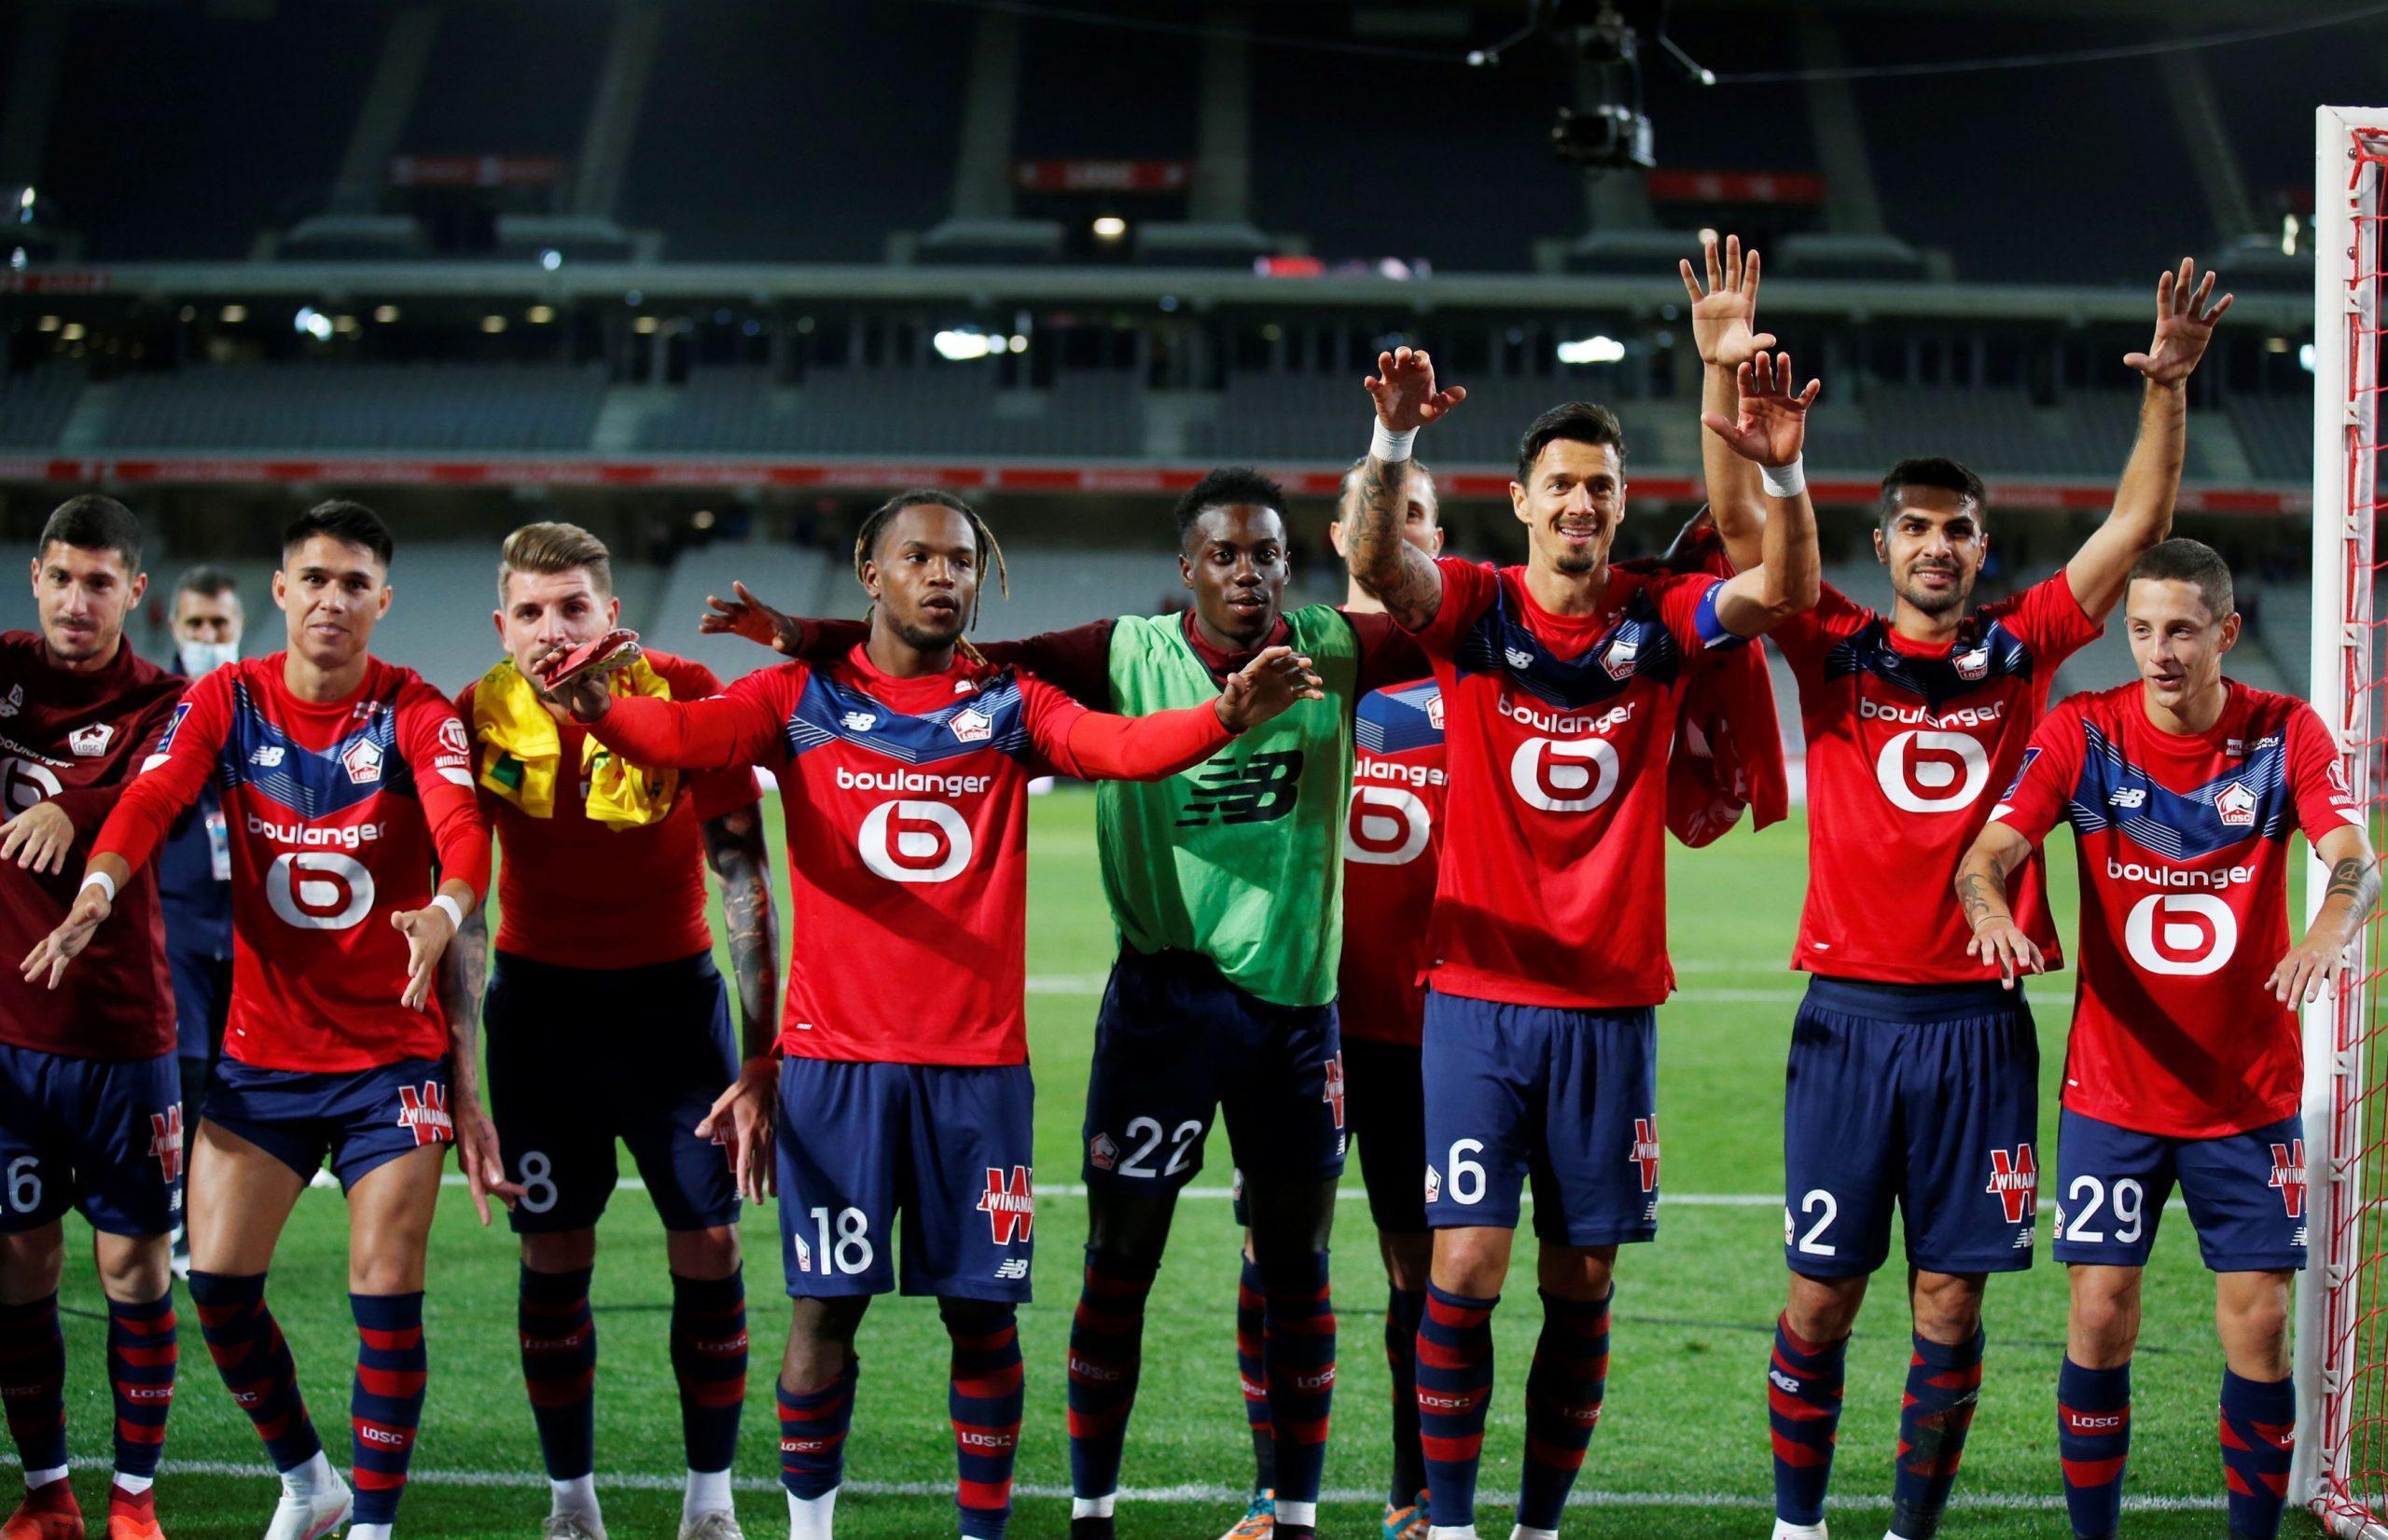 Slavlje nogometaša Lillea nakon pobjede/Foto REUTERS